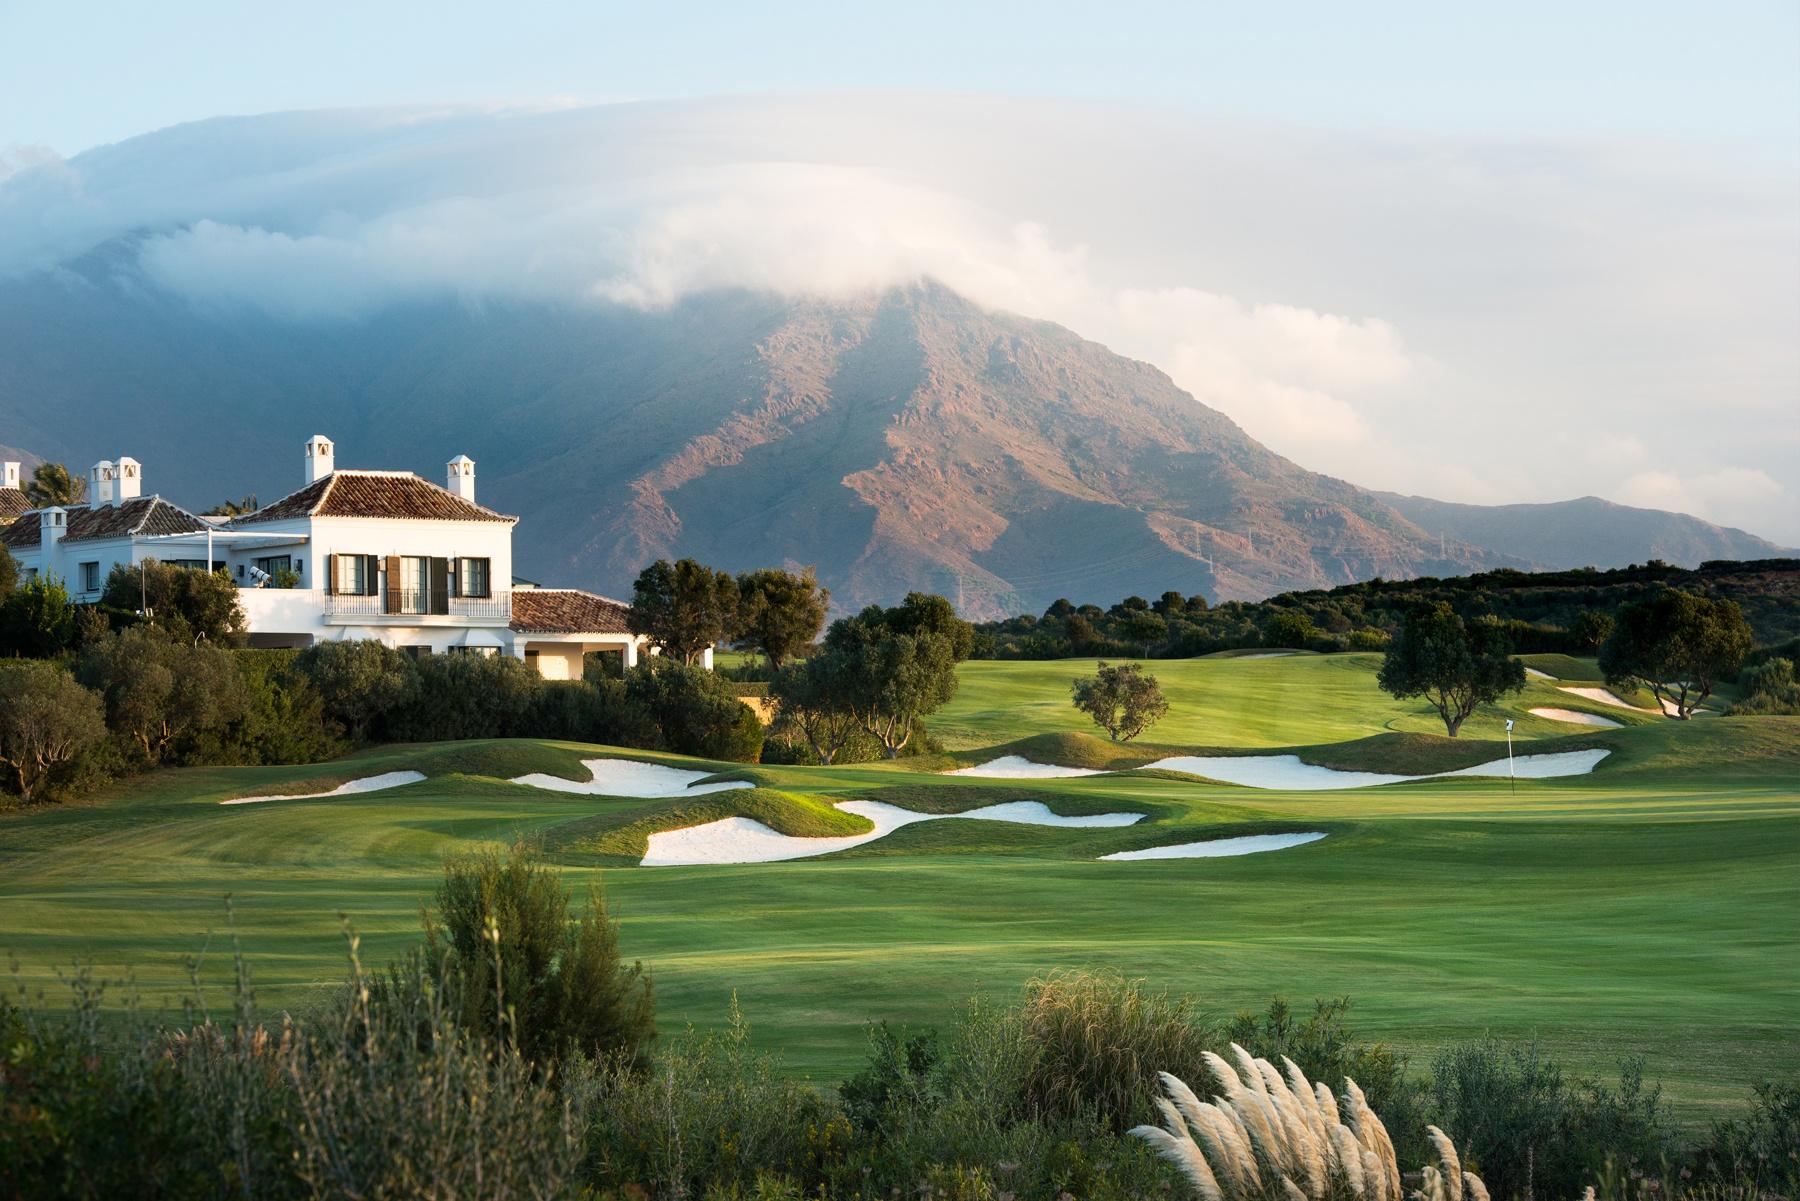 La Finca Cortesin Golf Club - Hosts of 2023 Solheim Cup